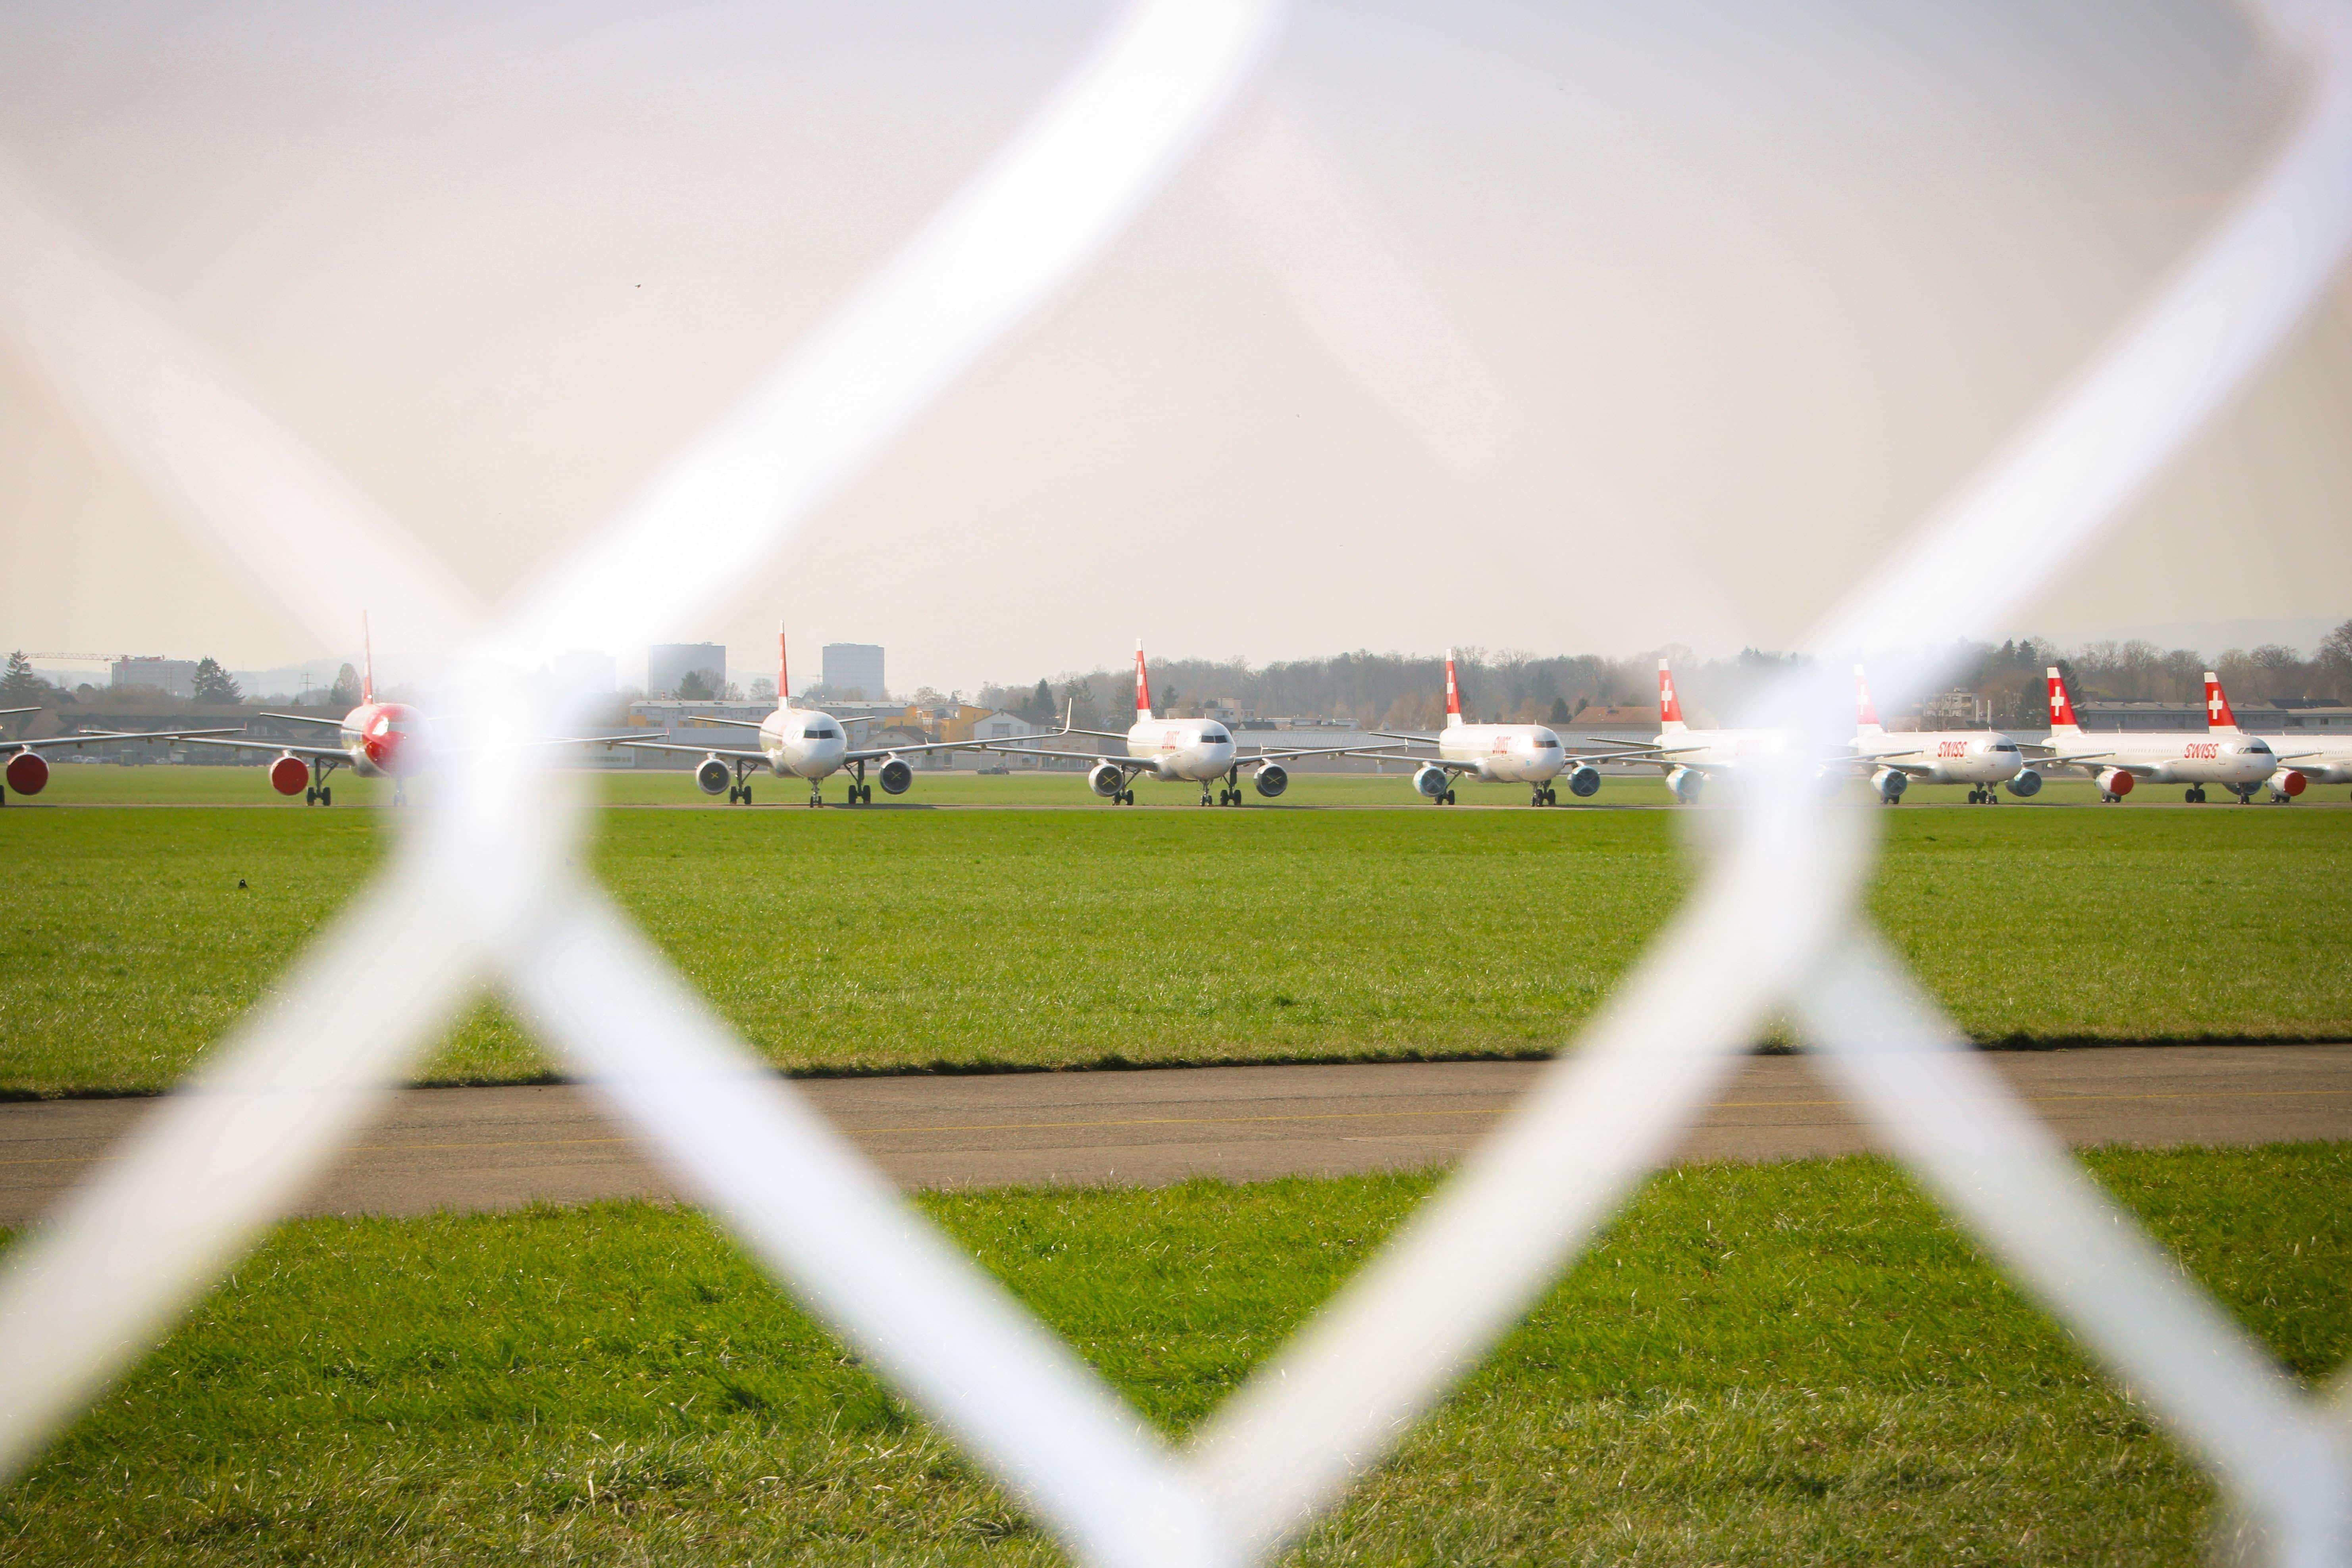 Parkede fly ved lufthavnen i Dübendorf, Schweiz. (Foto: Ellen Jenni)